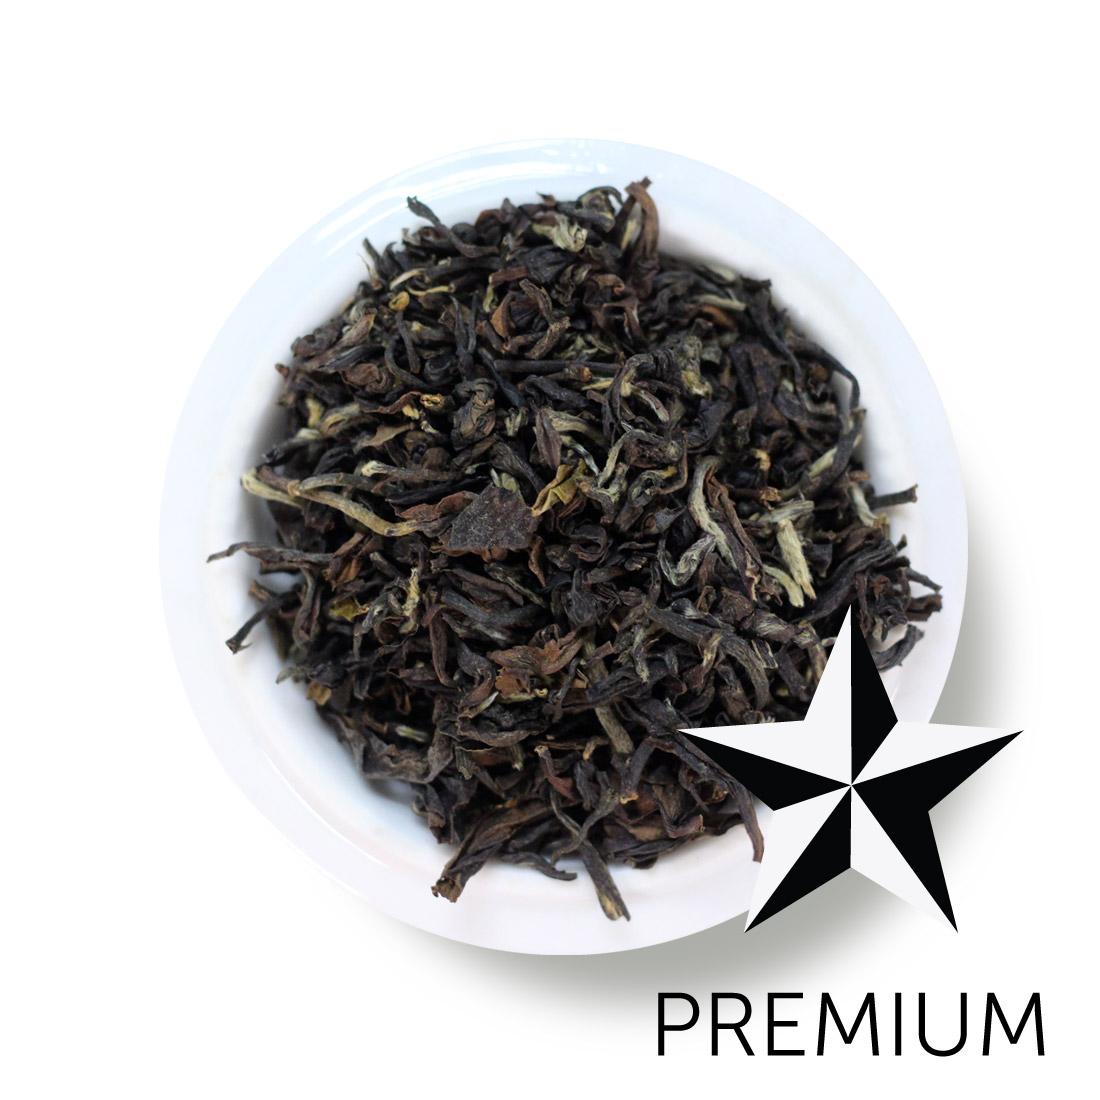 Premium Oolong Tea Formosa Bai Hao